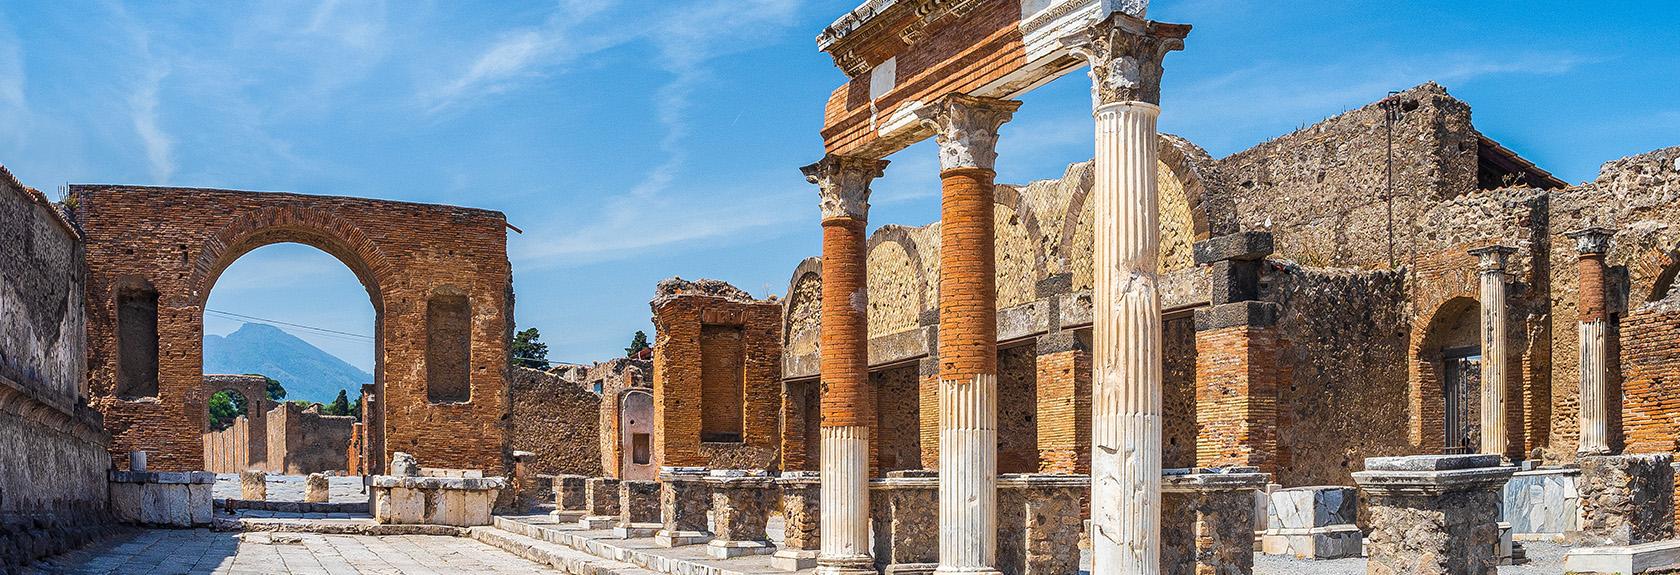 Dagtour naar Pompeii vanuit Rome